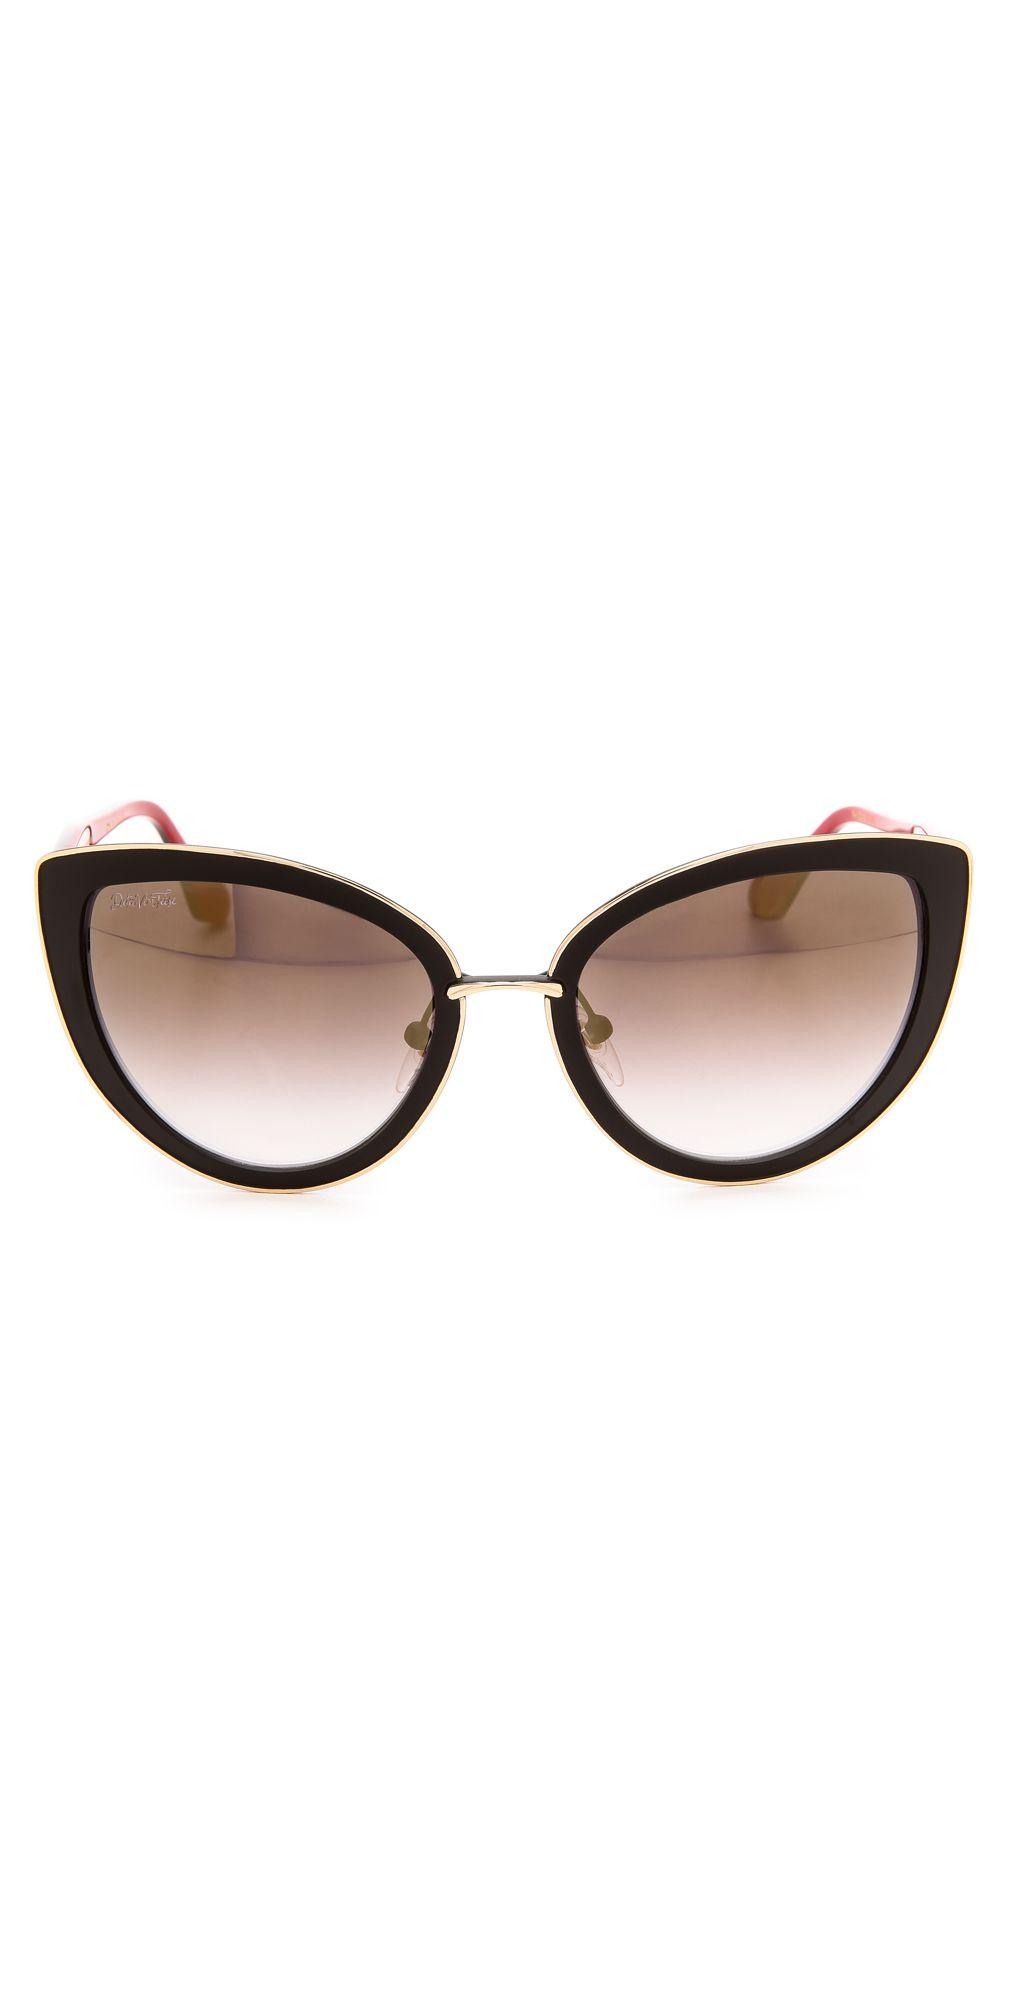 7c80c7a08c Dita Von Teese Eyewear Sophisticat Sunglasses